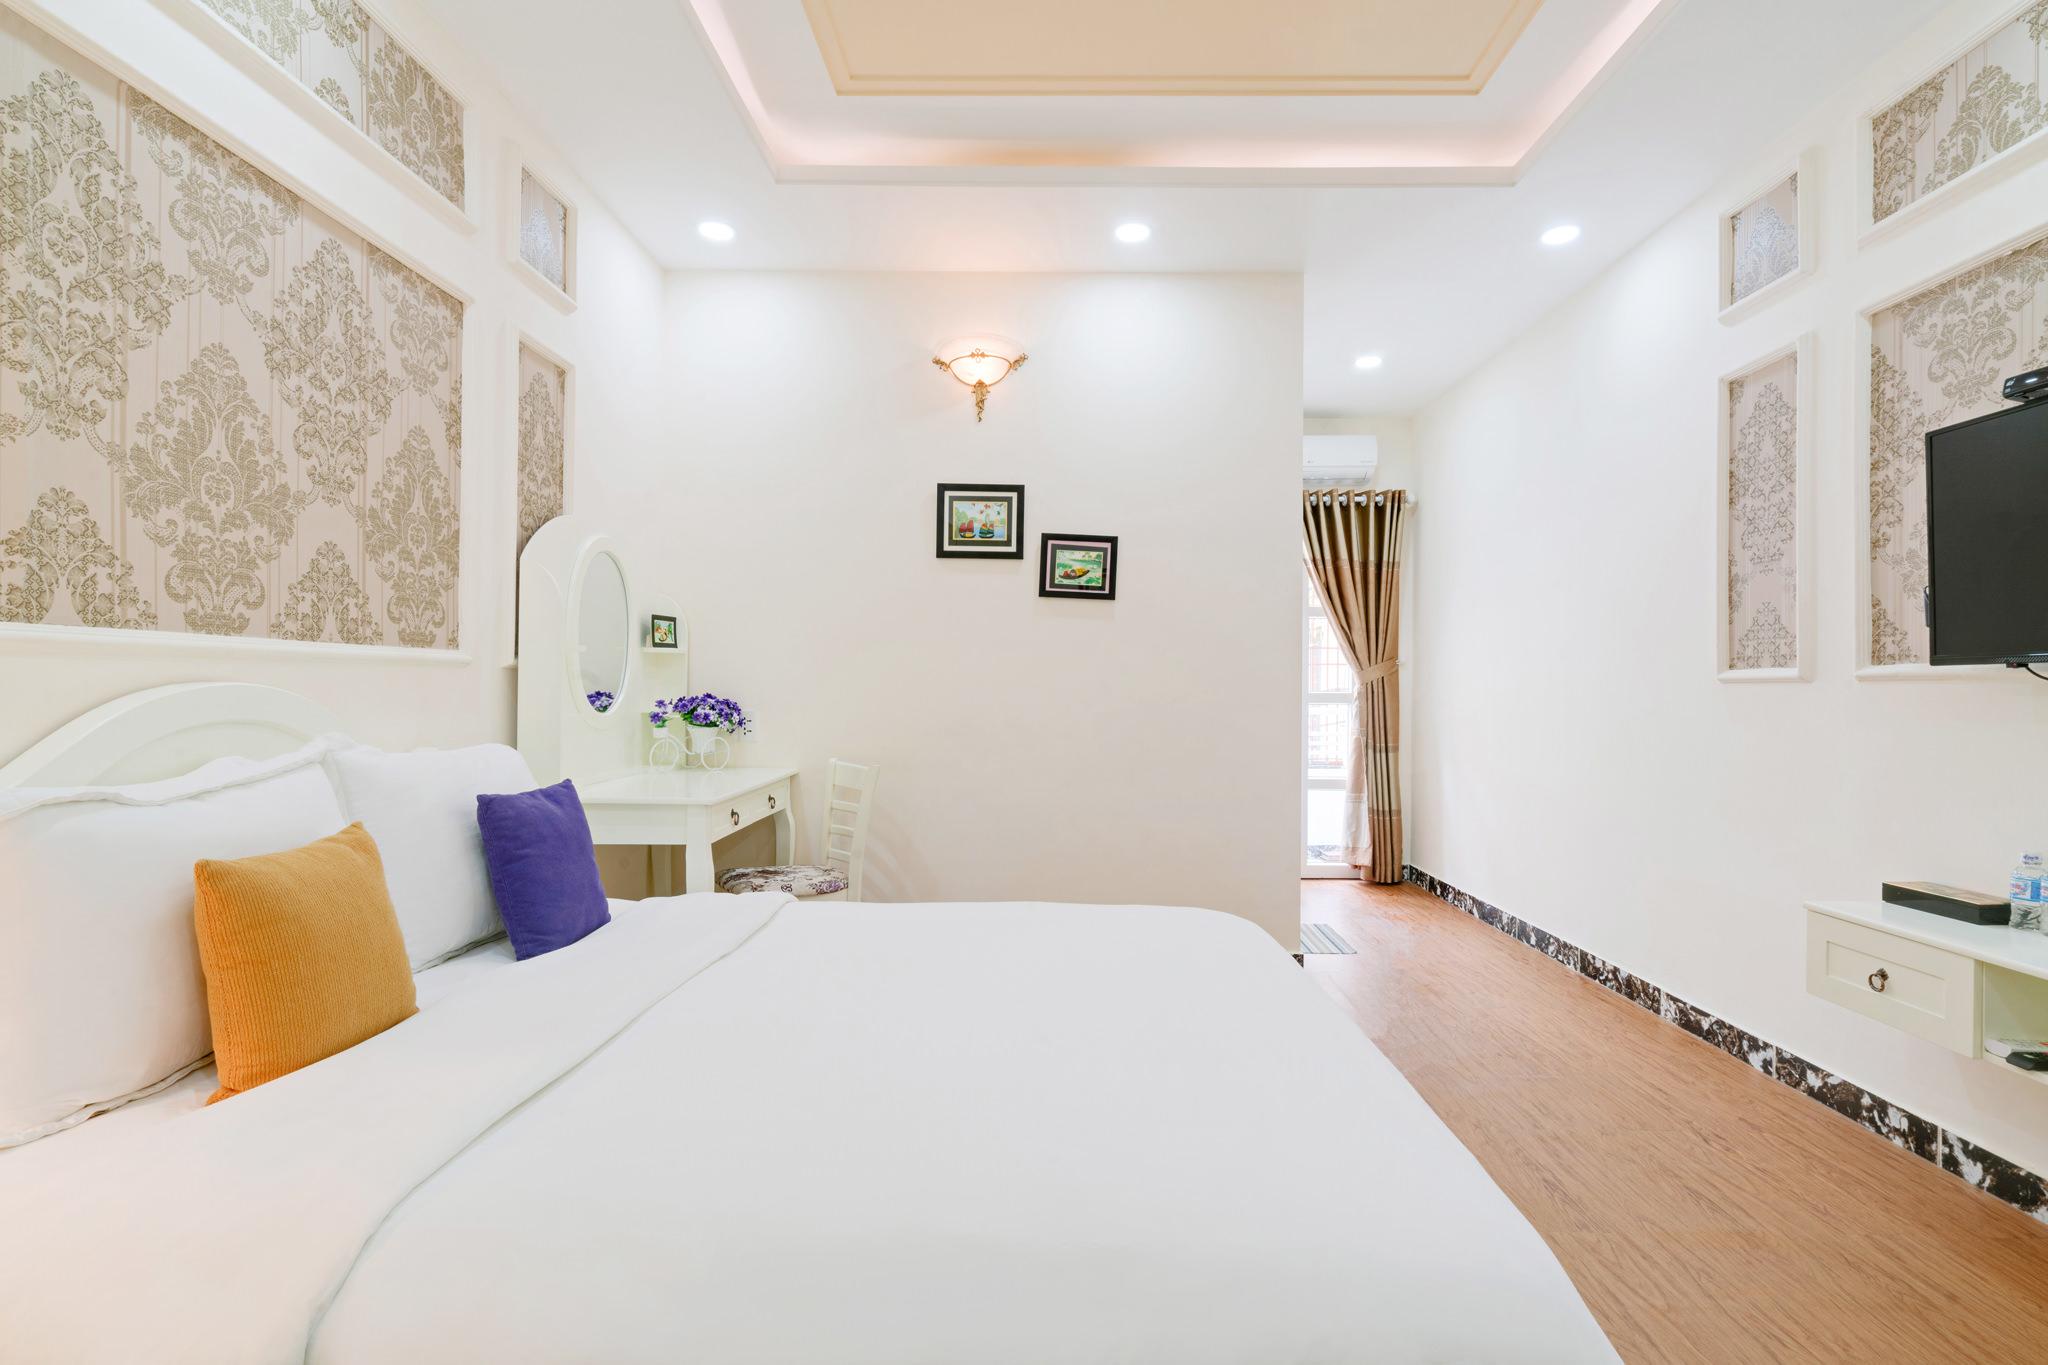 20180529 - Chez Mimosa - Interior - Hotel - 030.jpg